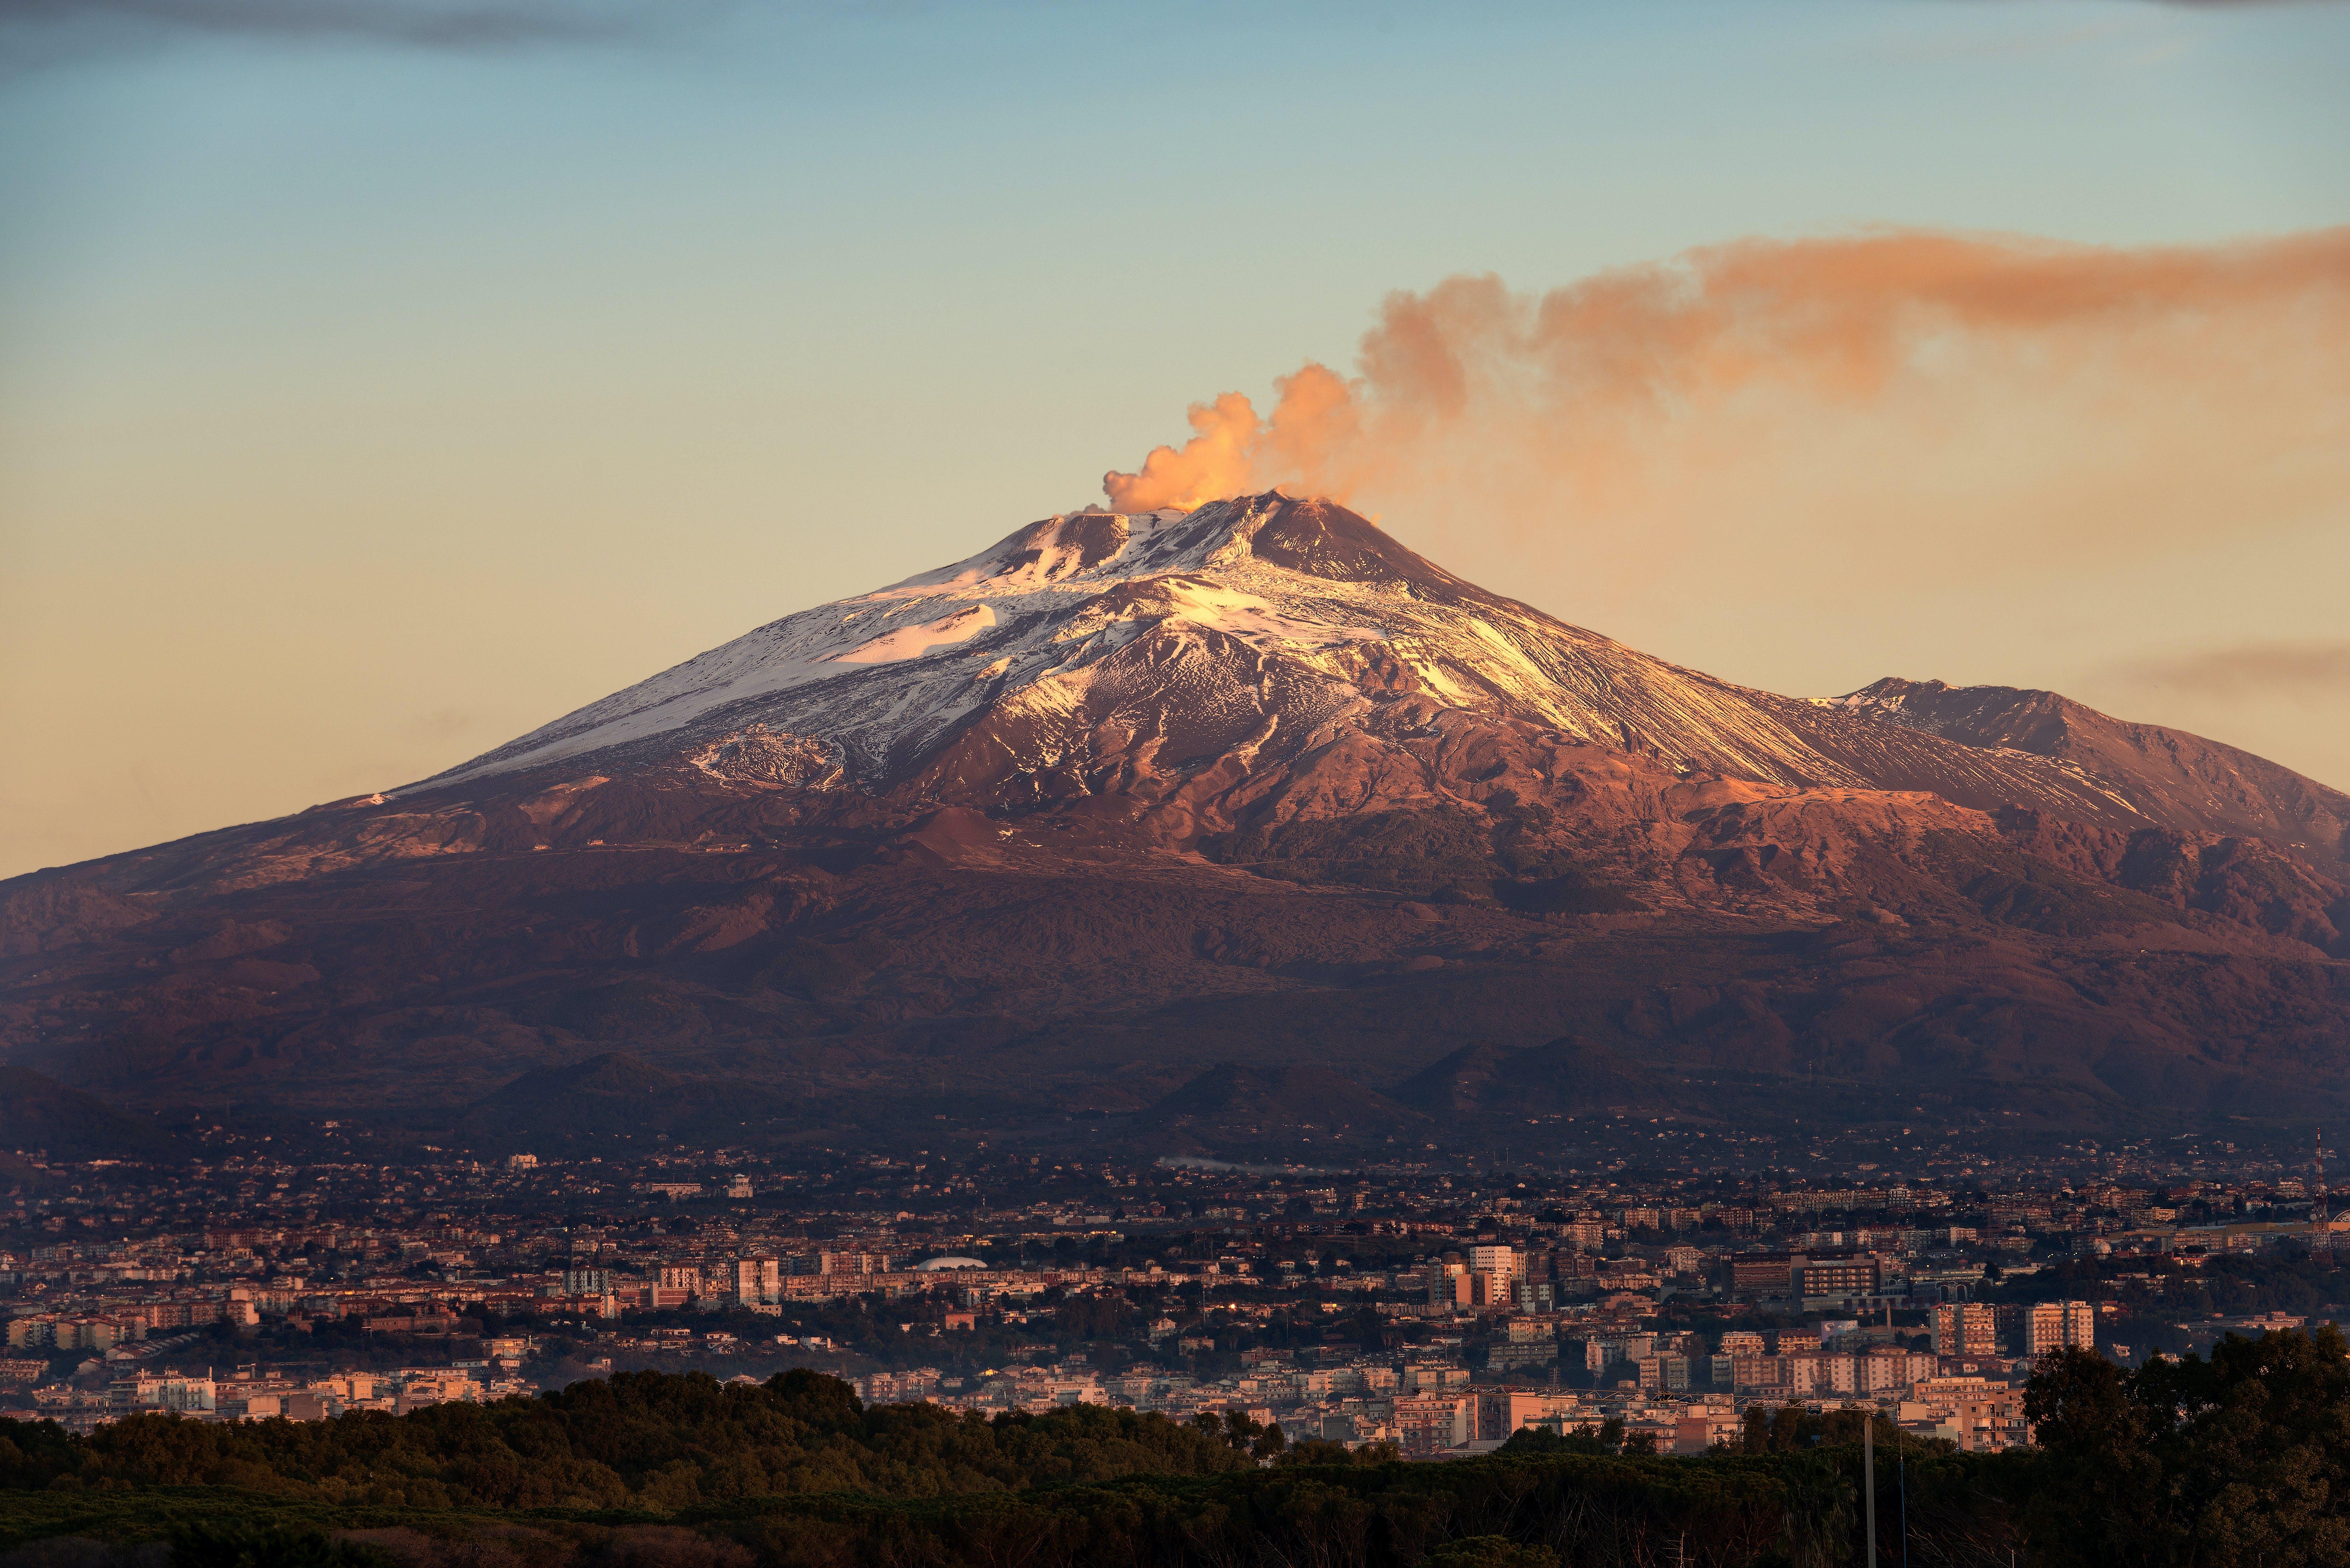 Vulkaner i Europa - Vulkanen Etna i Italien